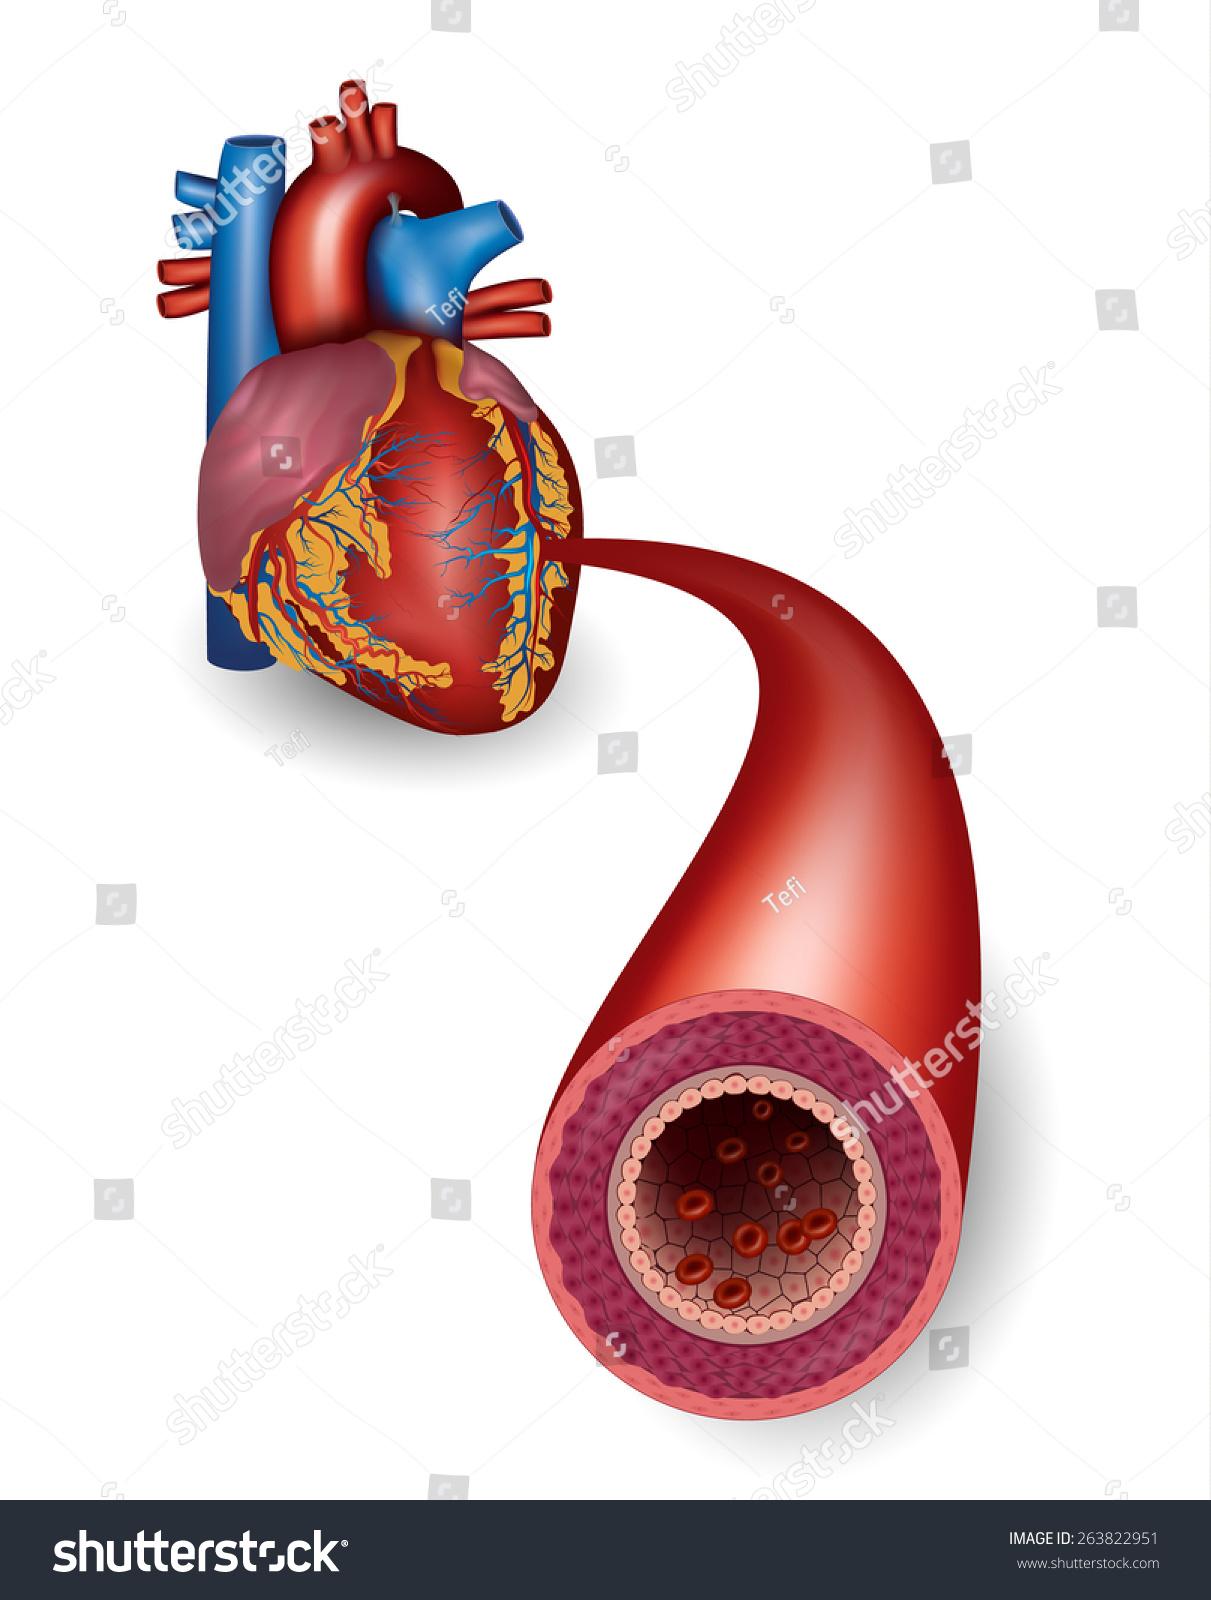 Healthy Artery Heart Anatomy Stock Illustration 263822951 - Shutterstock